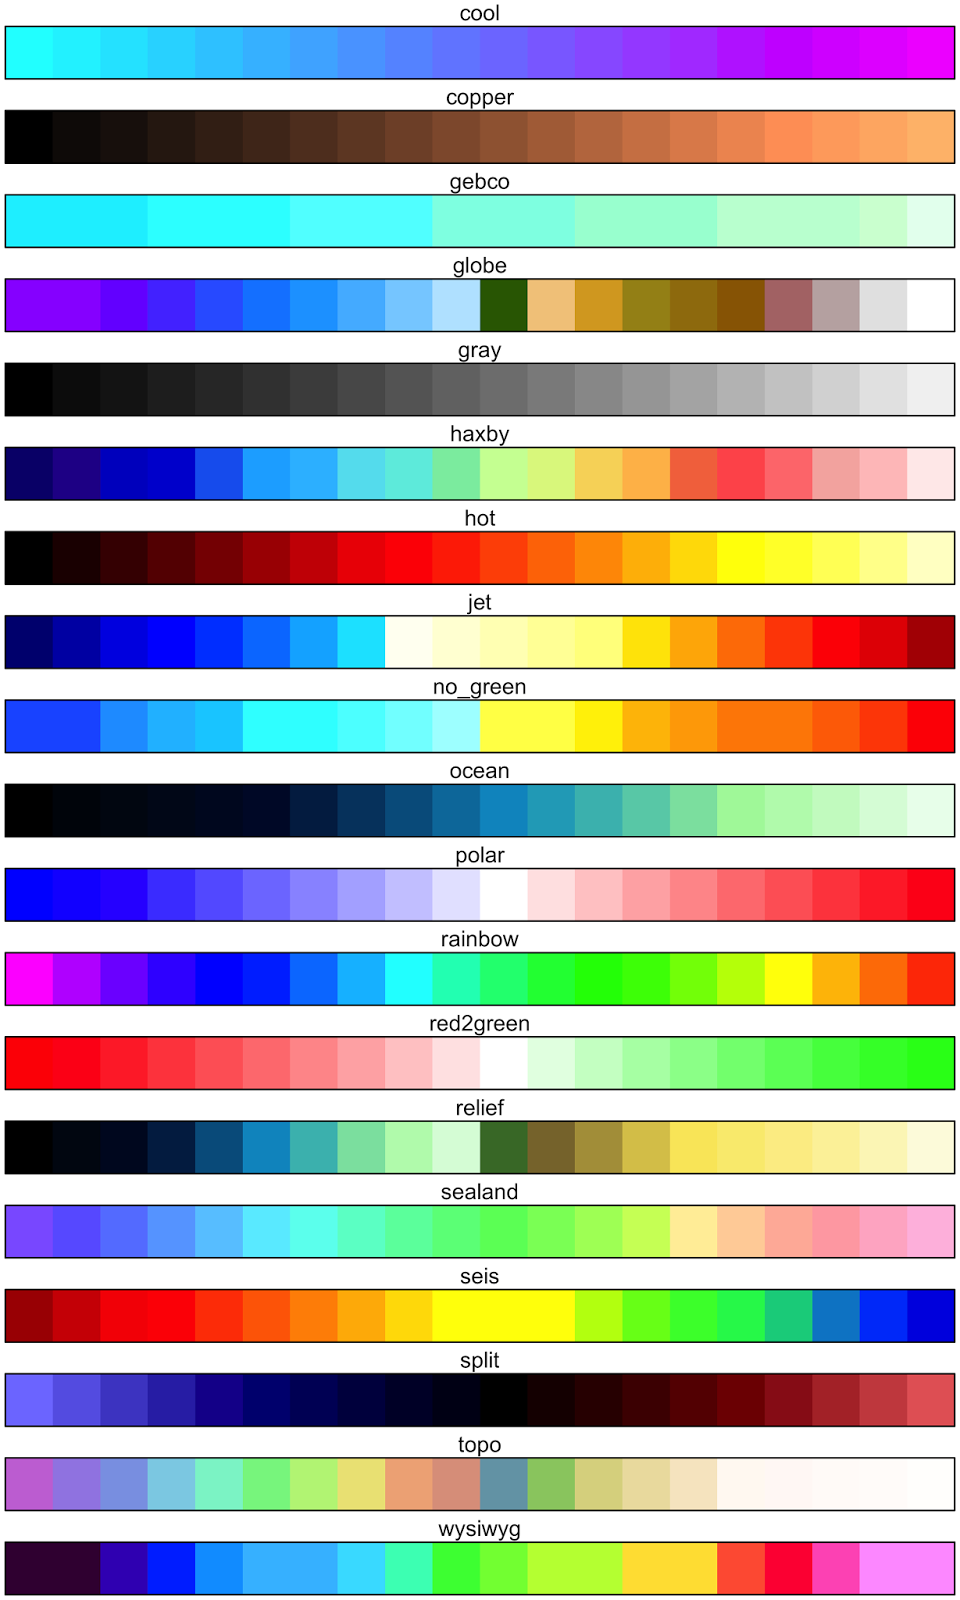 GMT standard color palettes